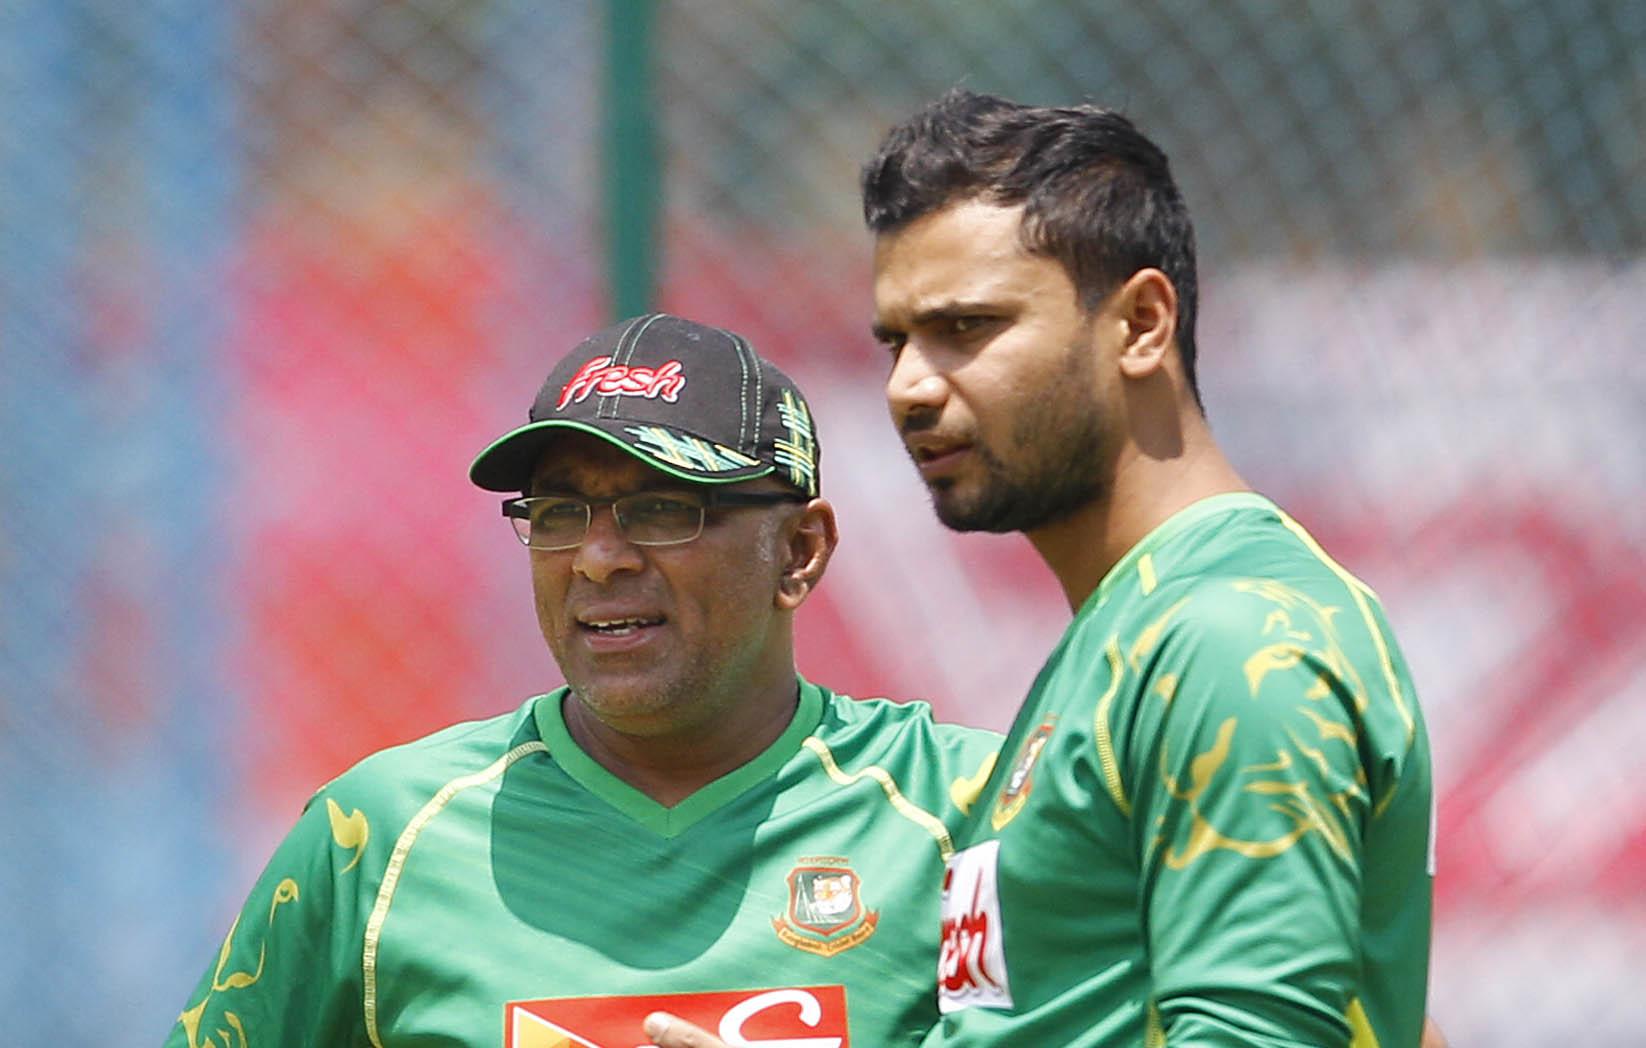 Bangladesh captain Mashrafe Mortaza  (right) talks with coach Chandika Hathurusingha in Bangalore on Sunday, on the eve of their match against Australia.